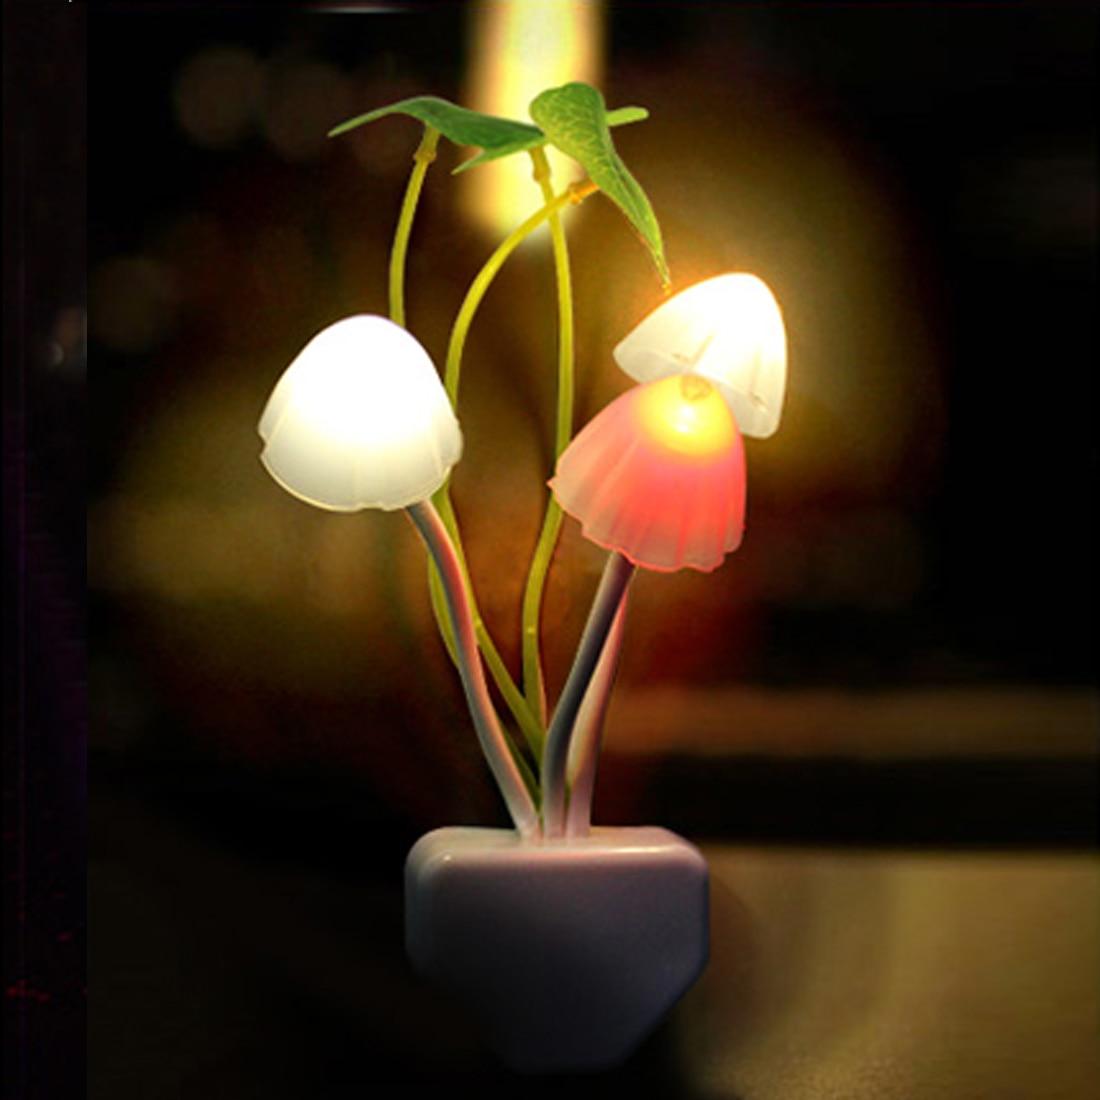 Children Bedroom Decoration  220V 3 LED Mushroom Fungus Night Light EU & US Plug Light Sensor Colorful Lamp Led Night Lights